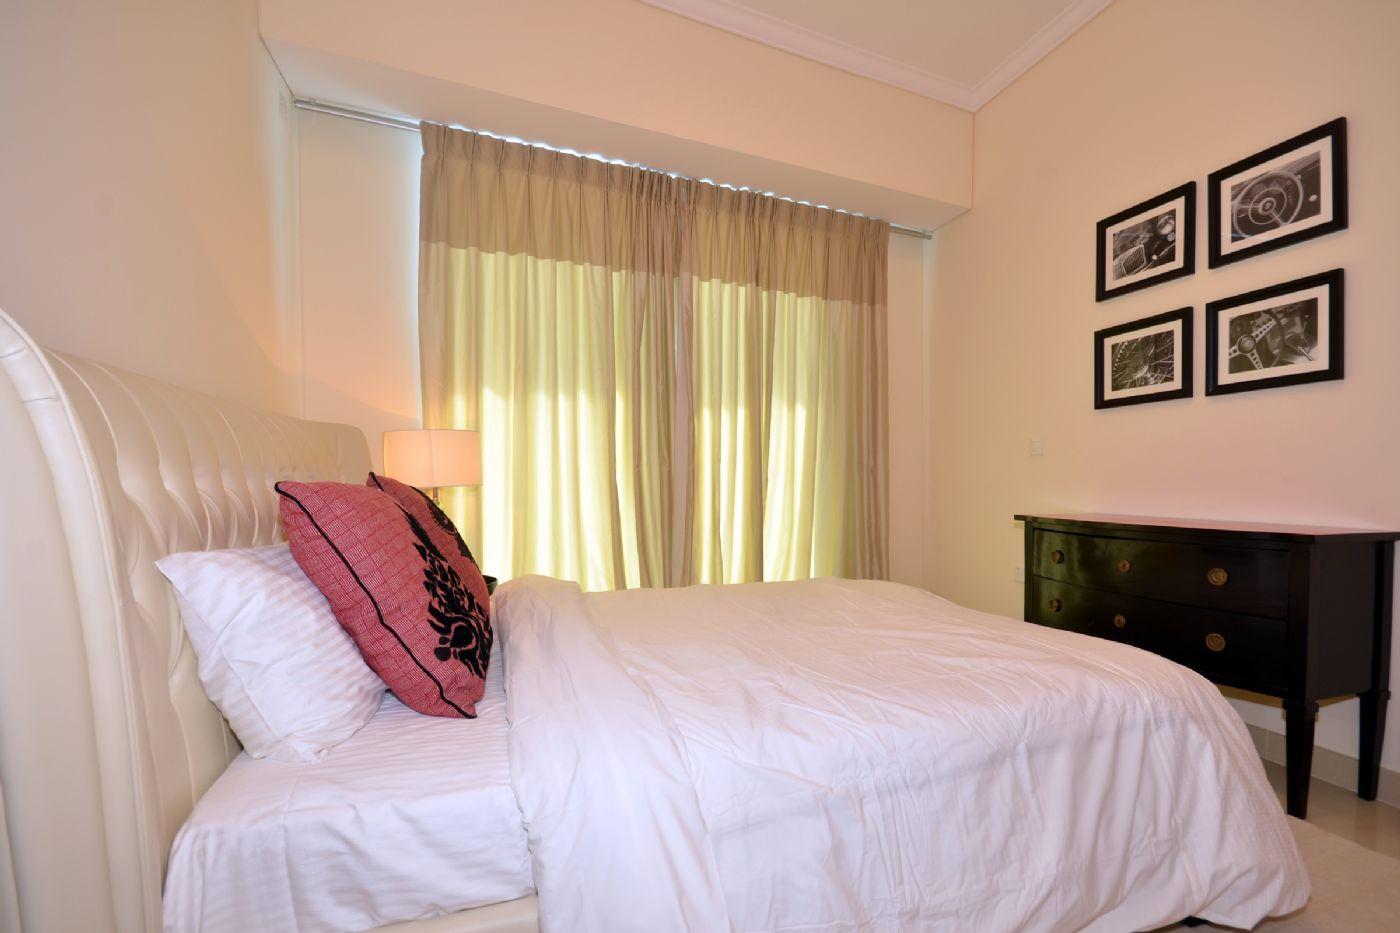 dubai holiday rentals 2 bedroom apartment 55th floor sea view